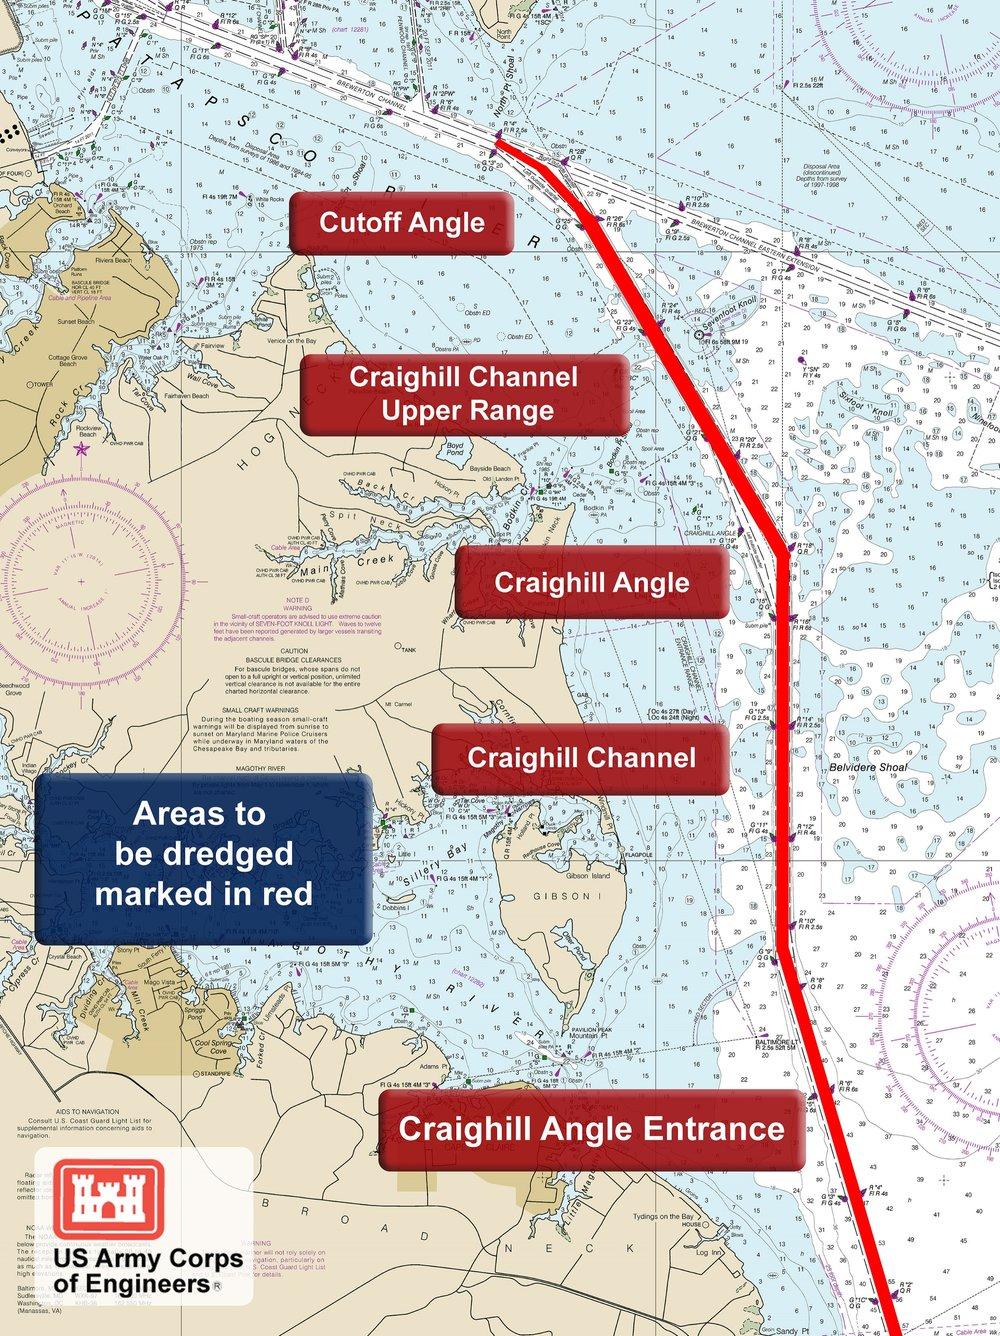 FY19Baltimore_Harbor_Dredging_Approach_Channels_NR_image.jpg